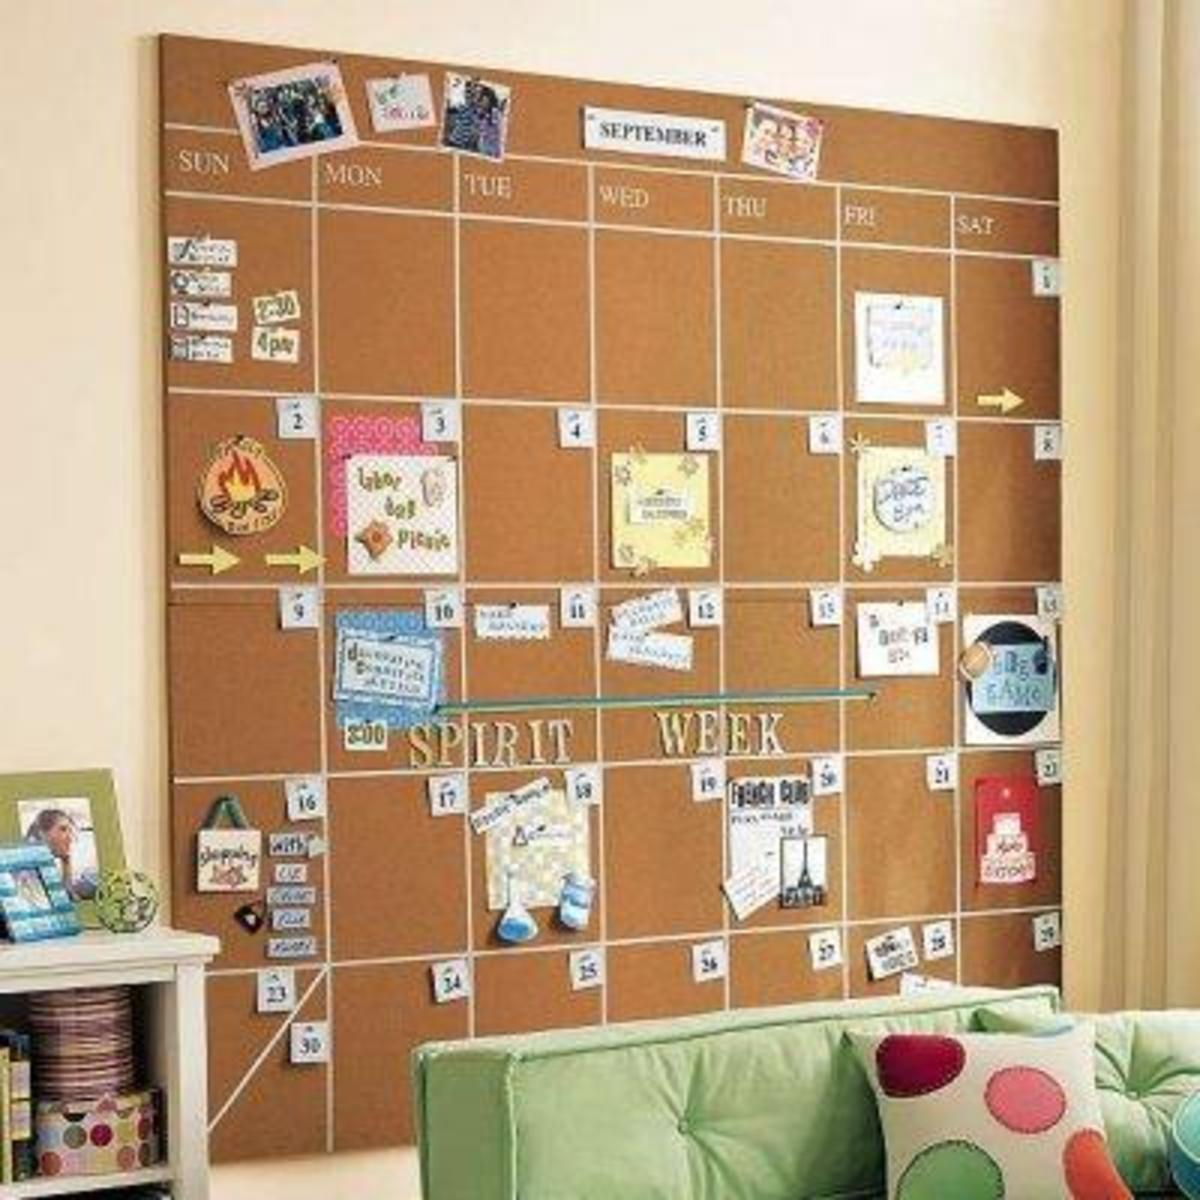 bedroom decorating ideas on a budget dengarden